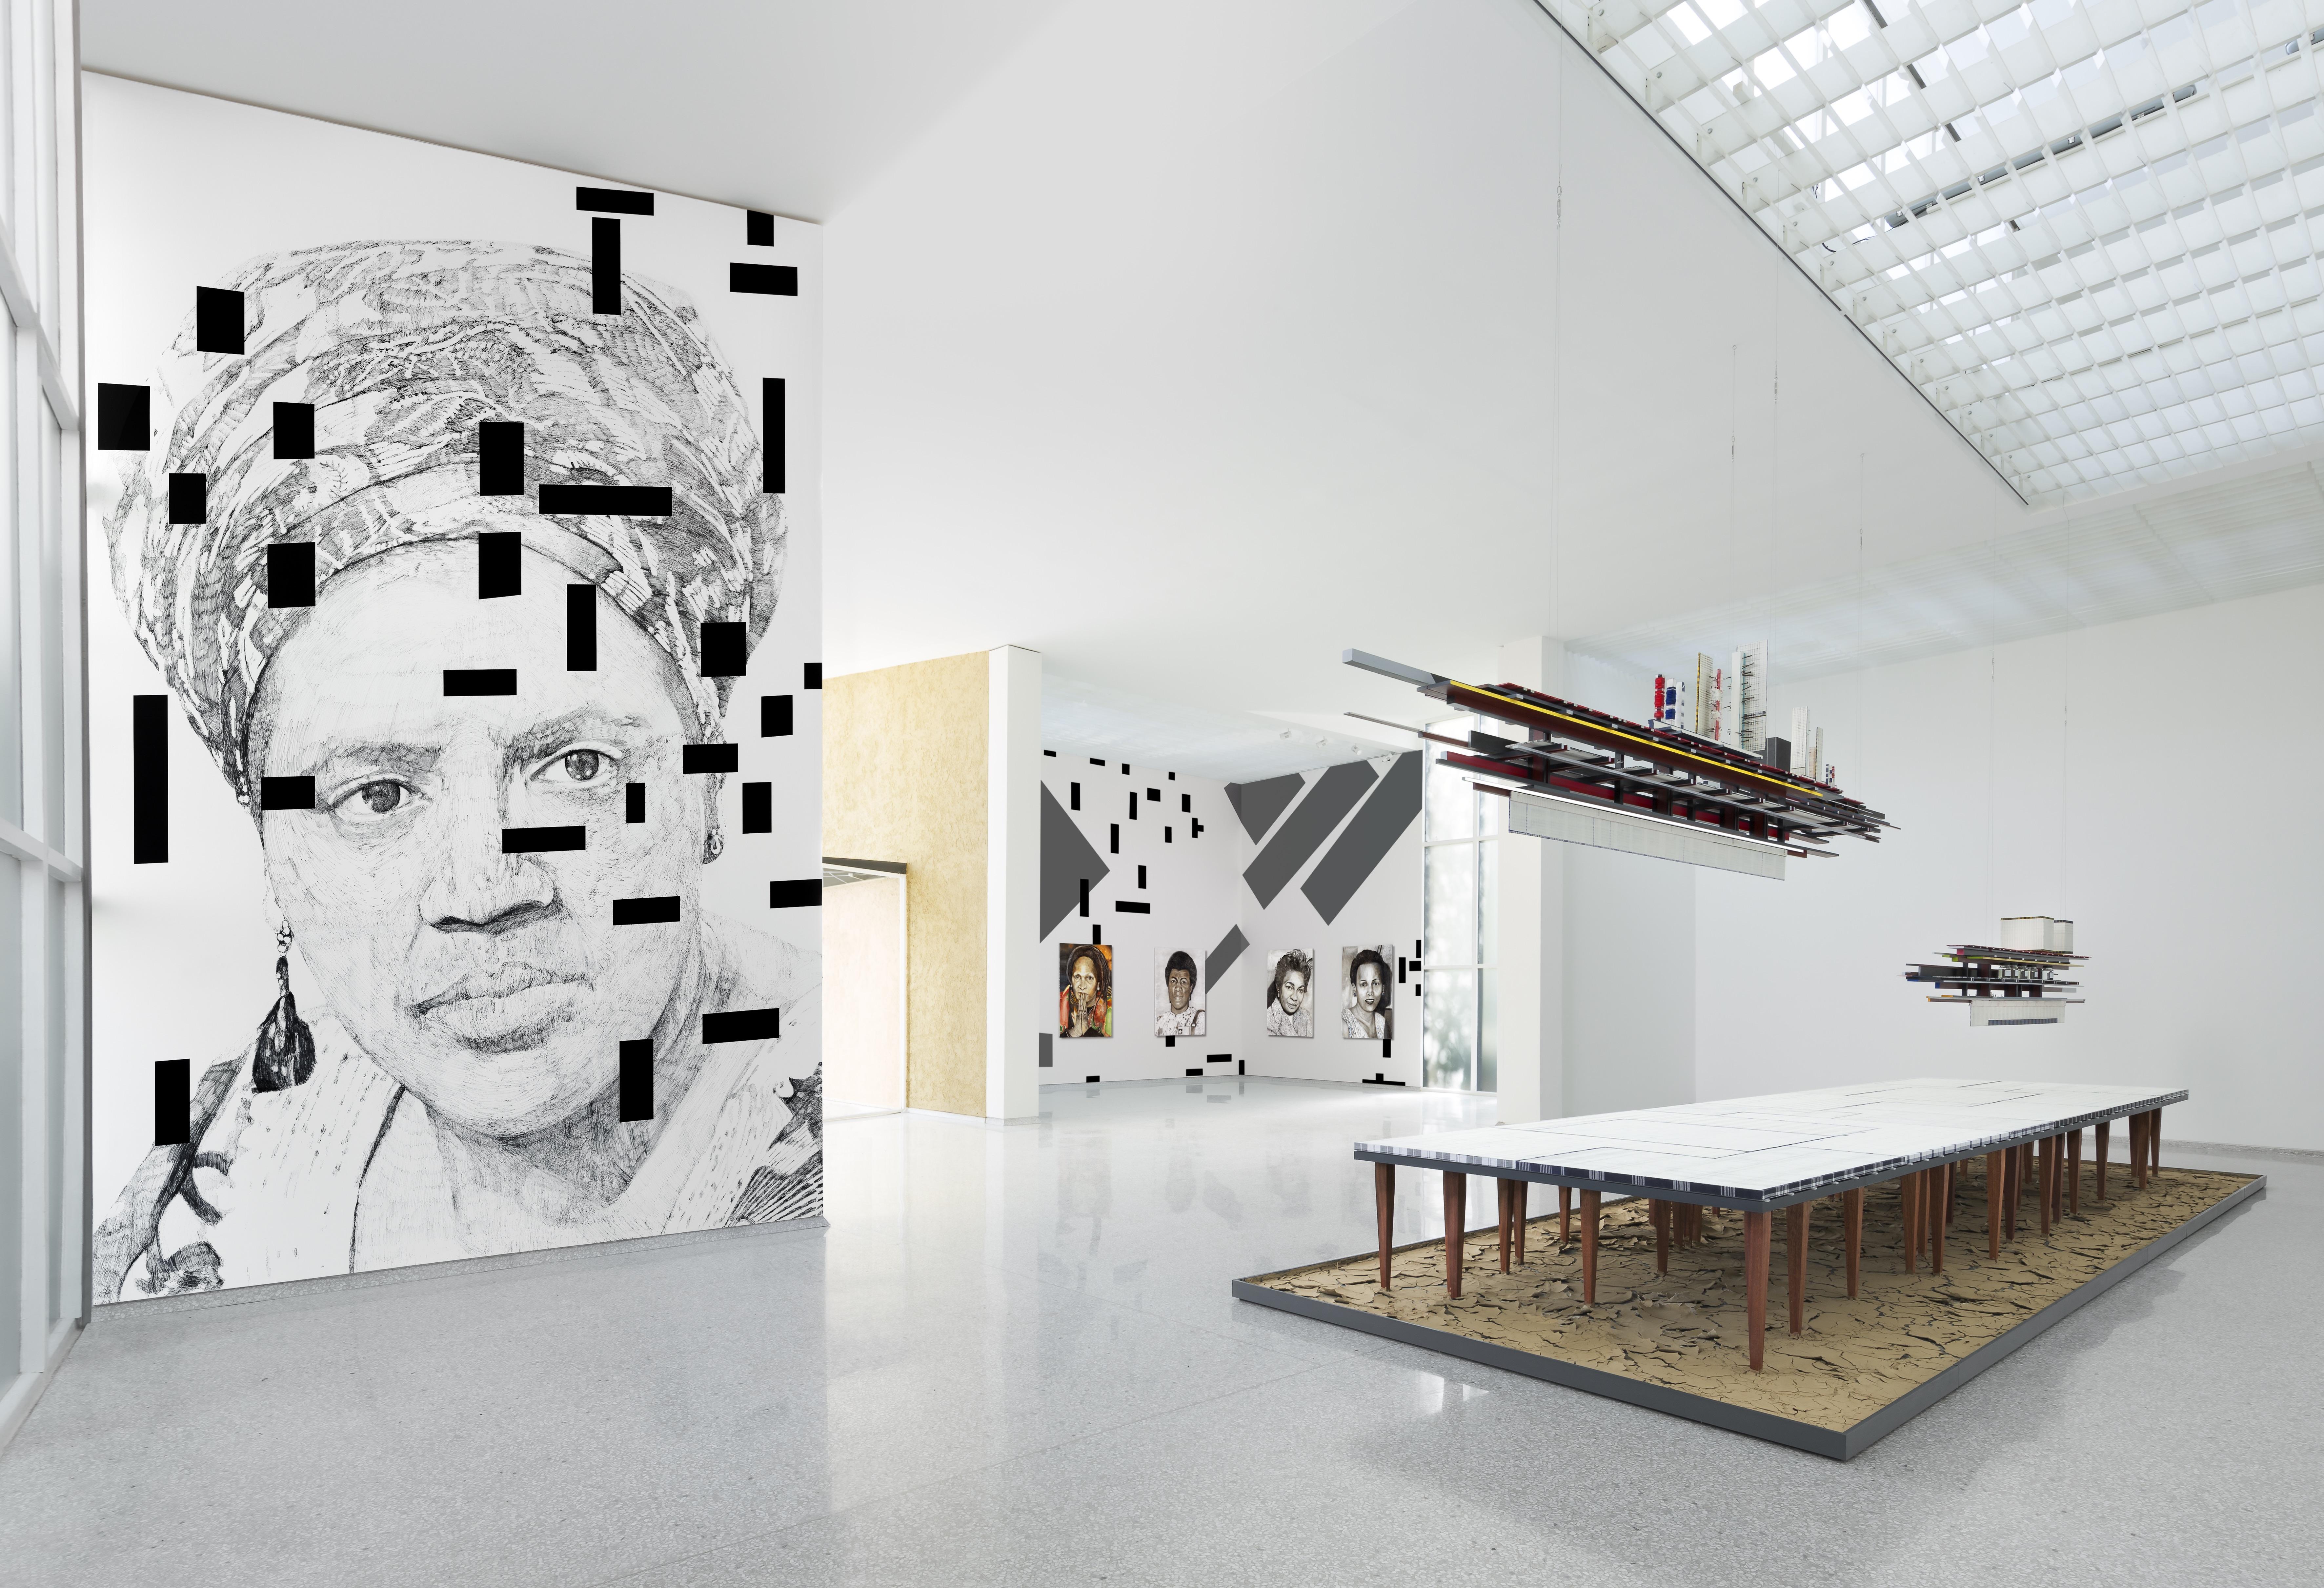 The Measurement of Presence, Iris Kensmil and Remy Jungerman, Dutch Pavilion, Venice Biennale, 2019. Photo by Gerrit Schreurs